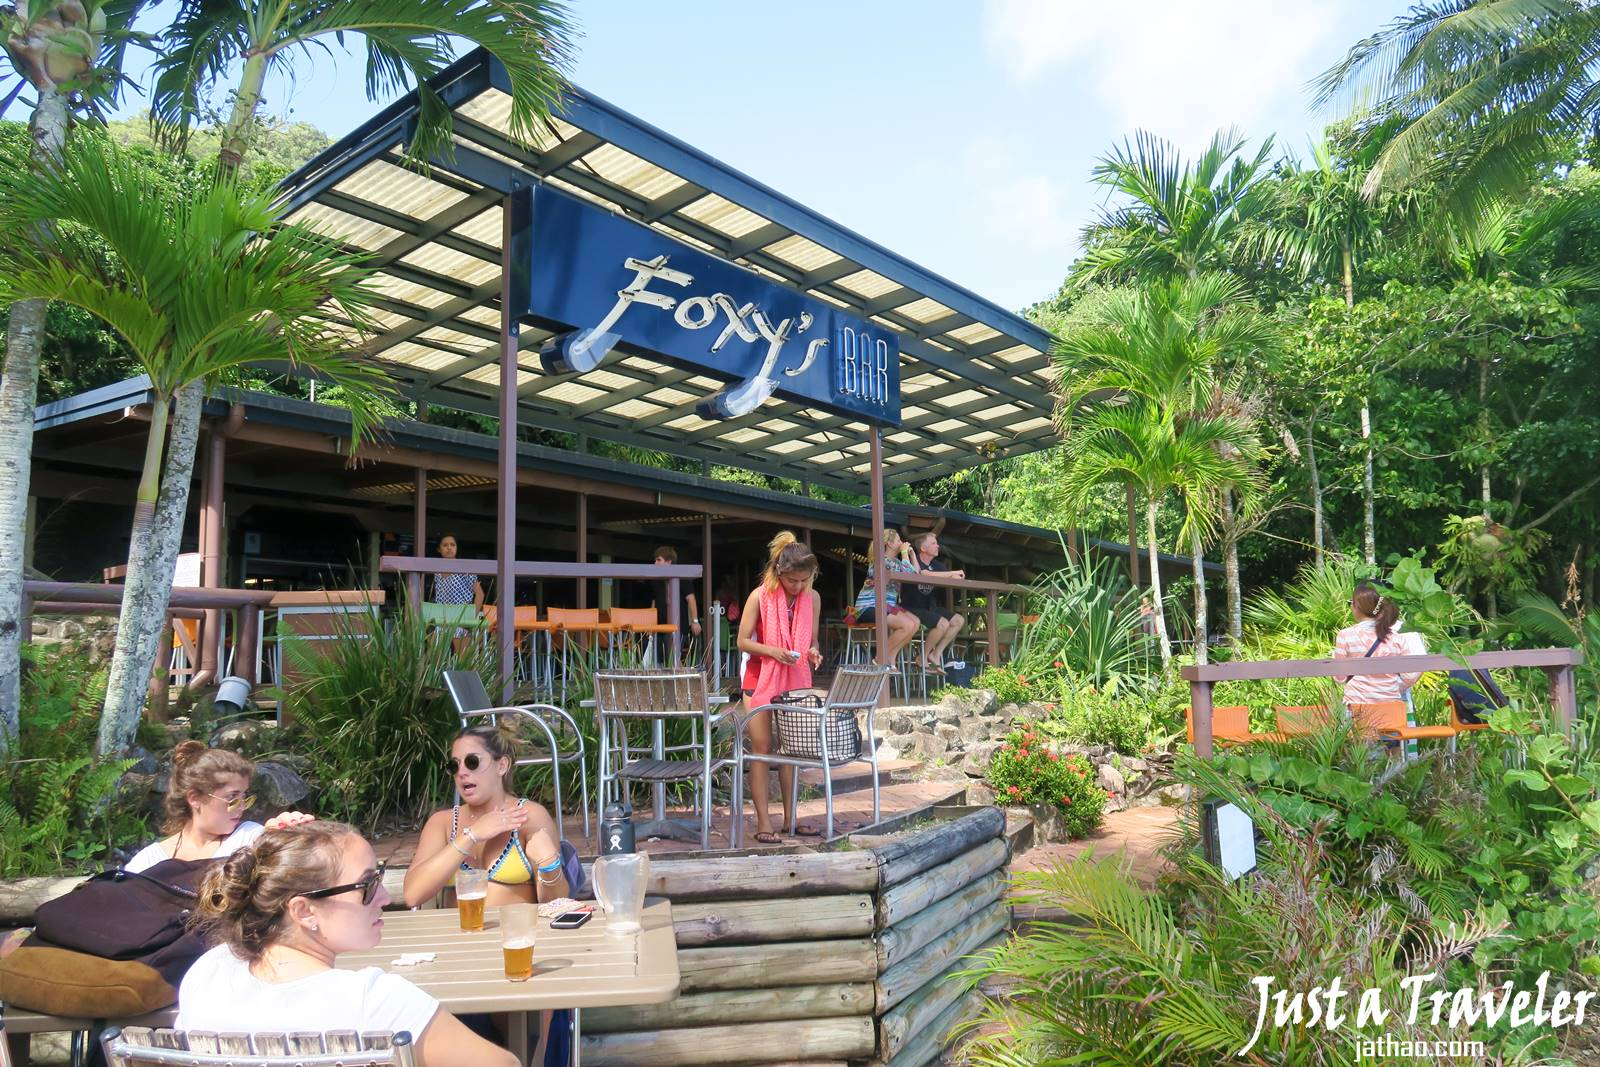 凱恩斯-大堡礁-翡翠島-度假村-內堡礁-推薦-旅遊-自由行-澳洲-Carins-Great-Barrier-Reef-Fitzroy-Island-Resort-Travel-Australia